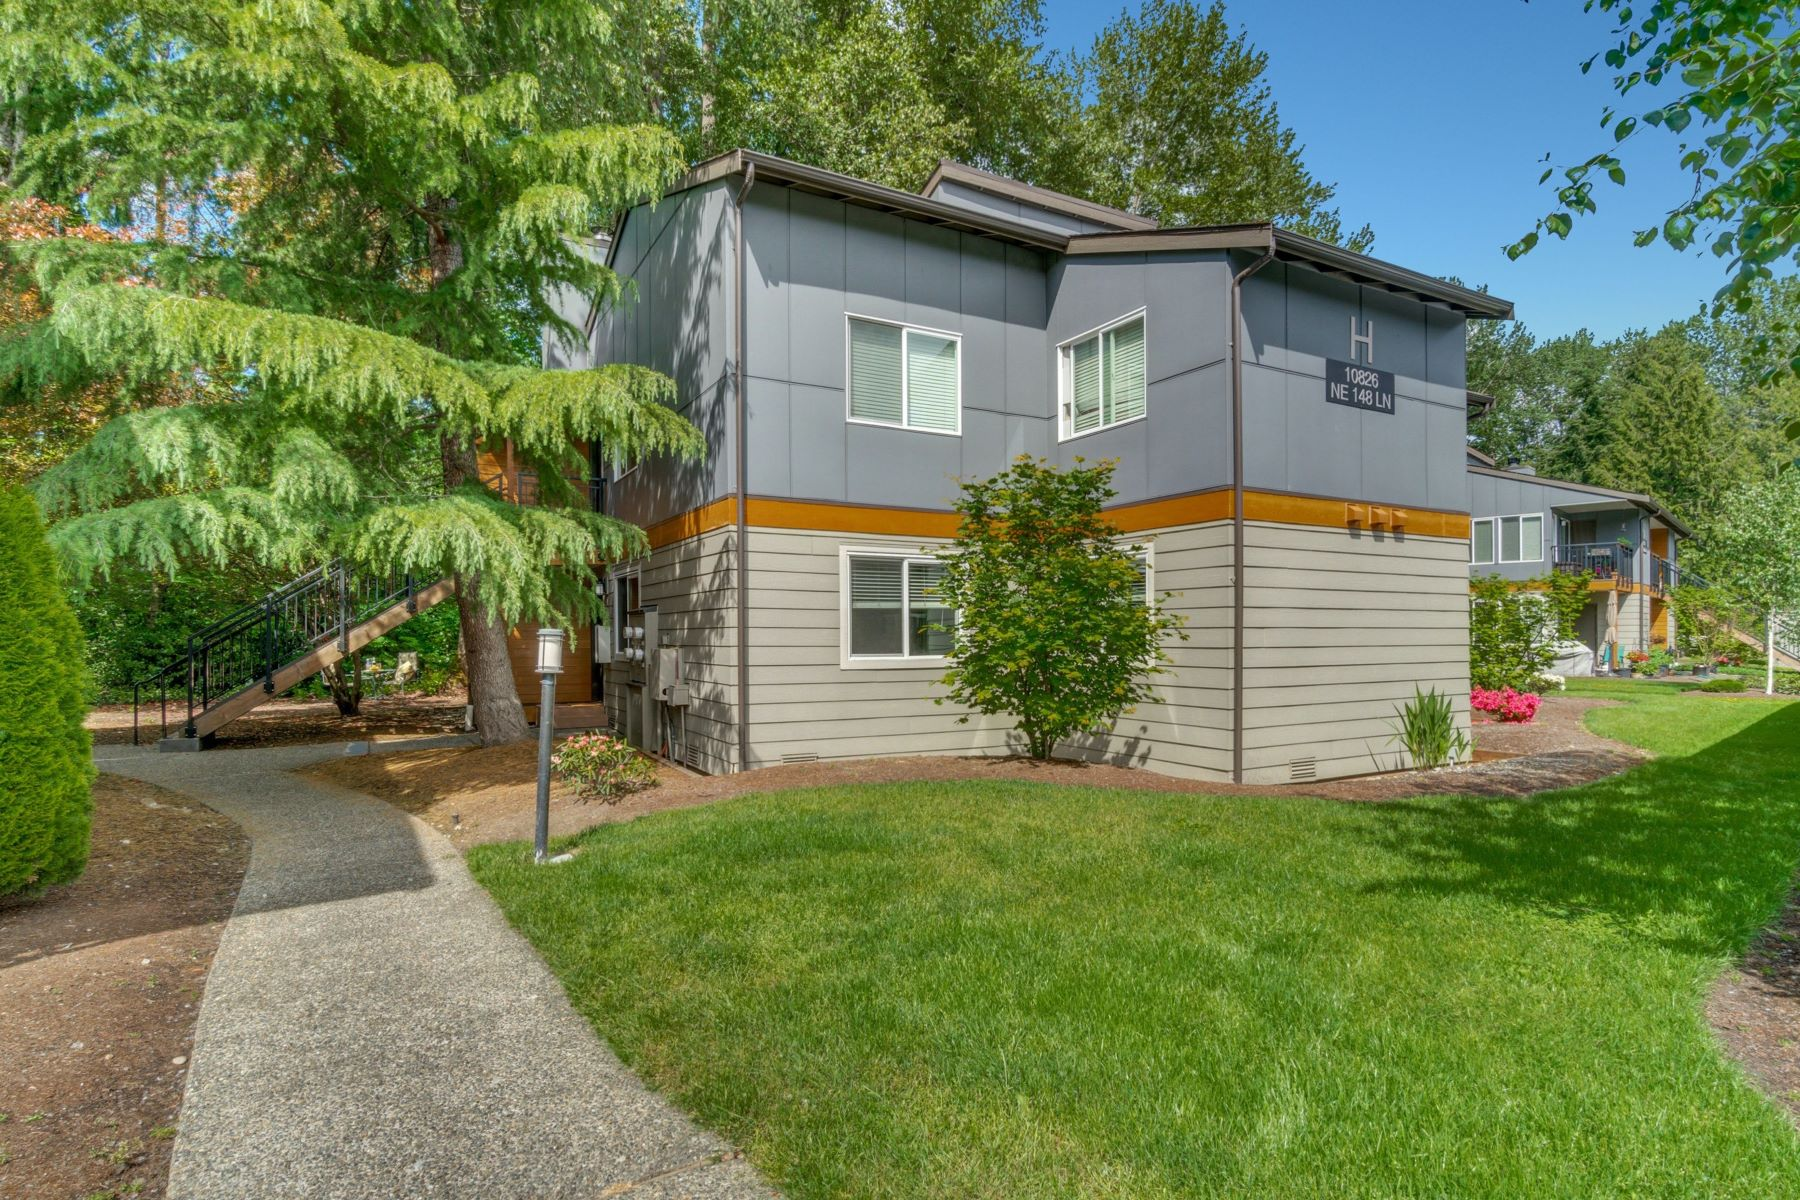 Condominiums for Sale at 10826 NE 148th Lane Unit #H101, Bothell, WA 98011 Bothell, Washington 98011 United States